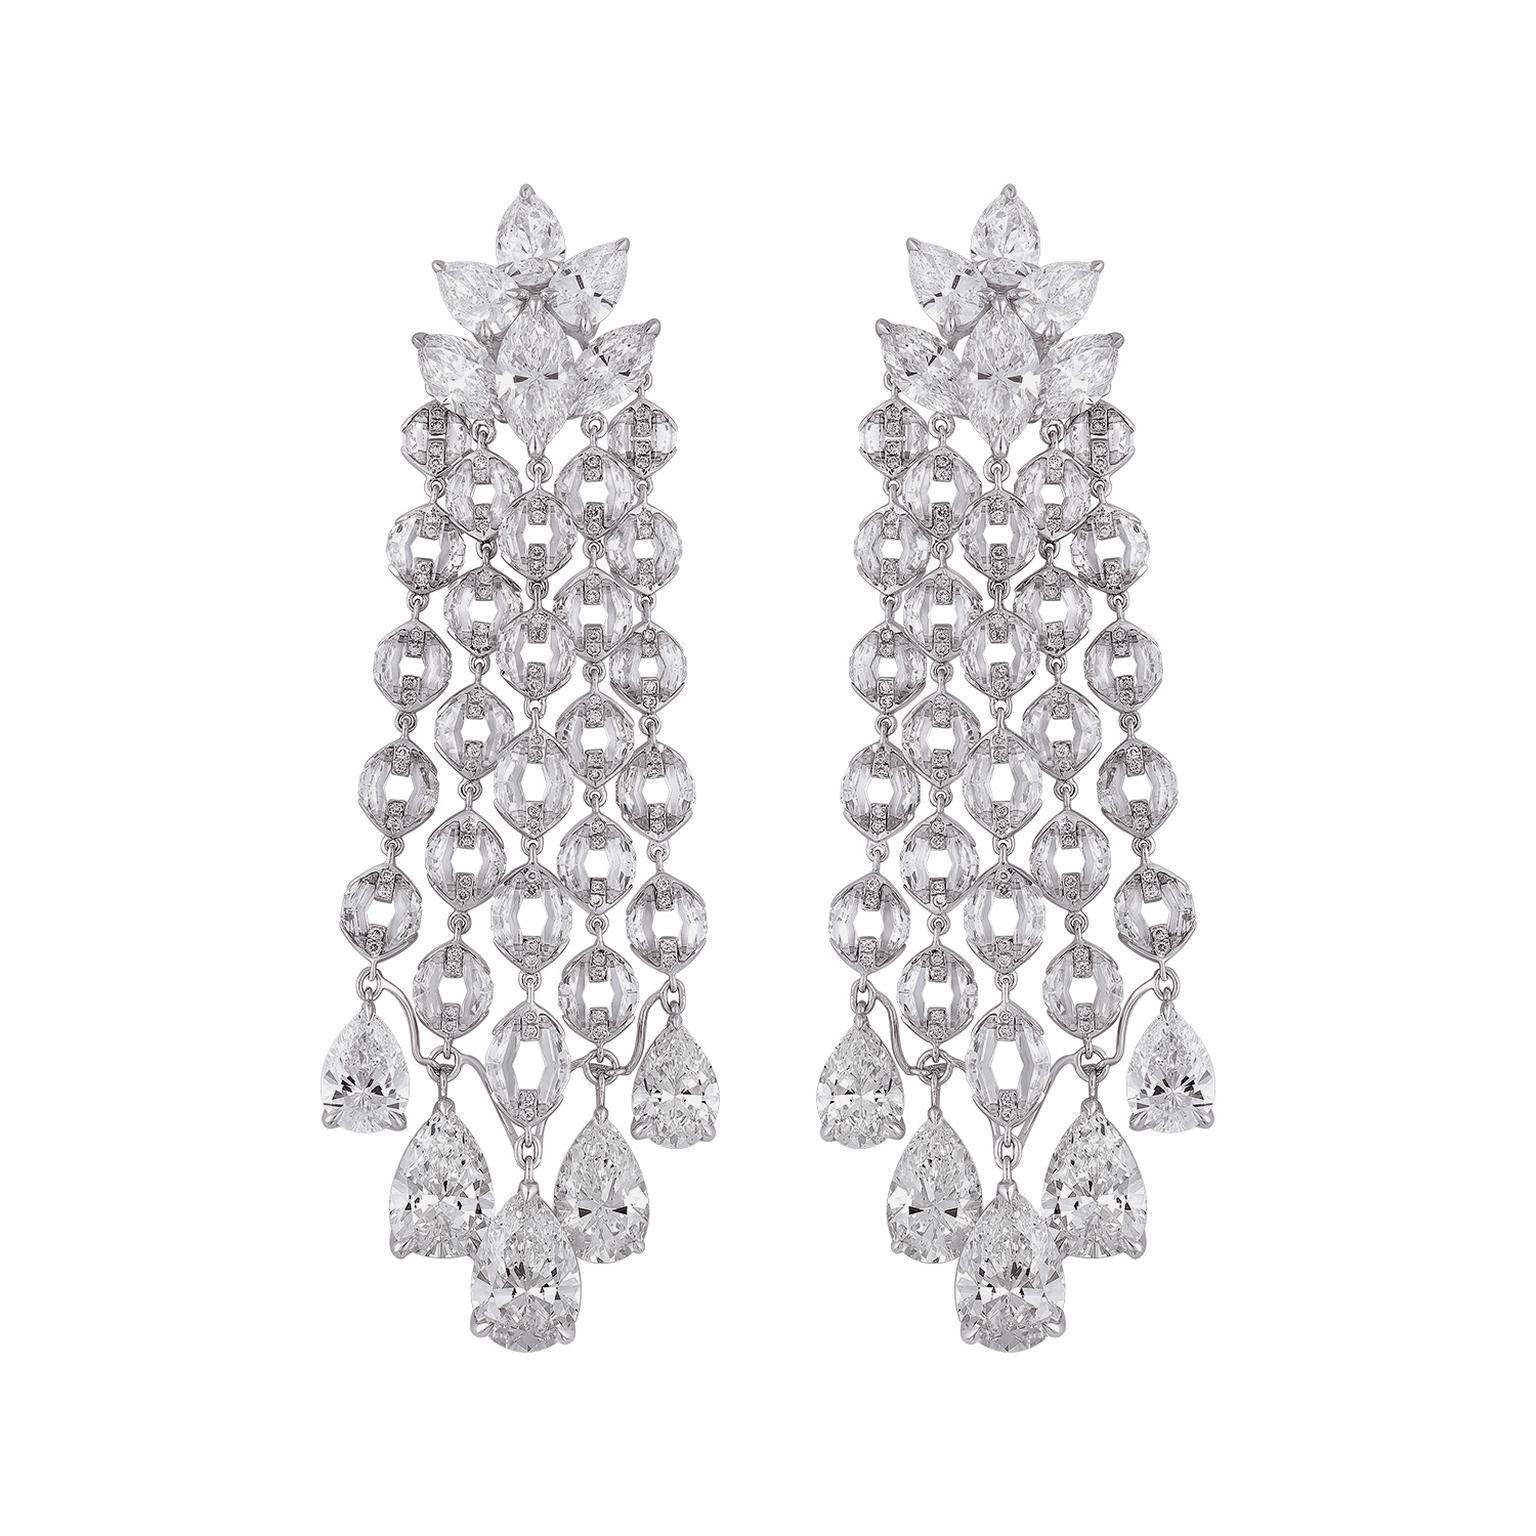 Garden Of Kalahari High Jewellery Diamond Earrings